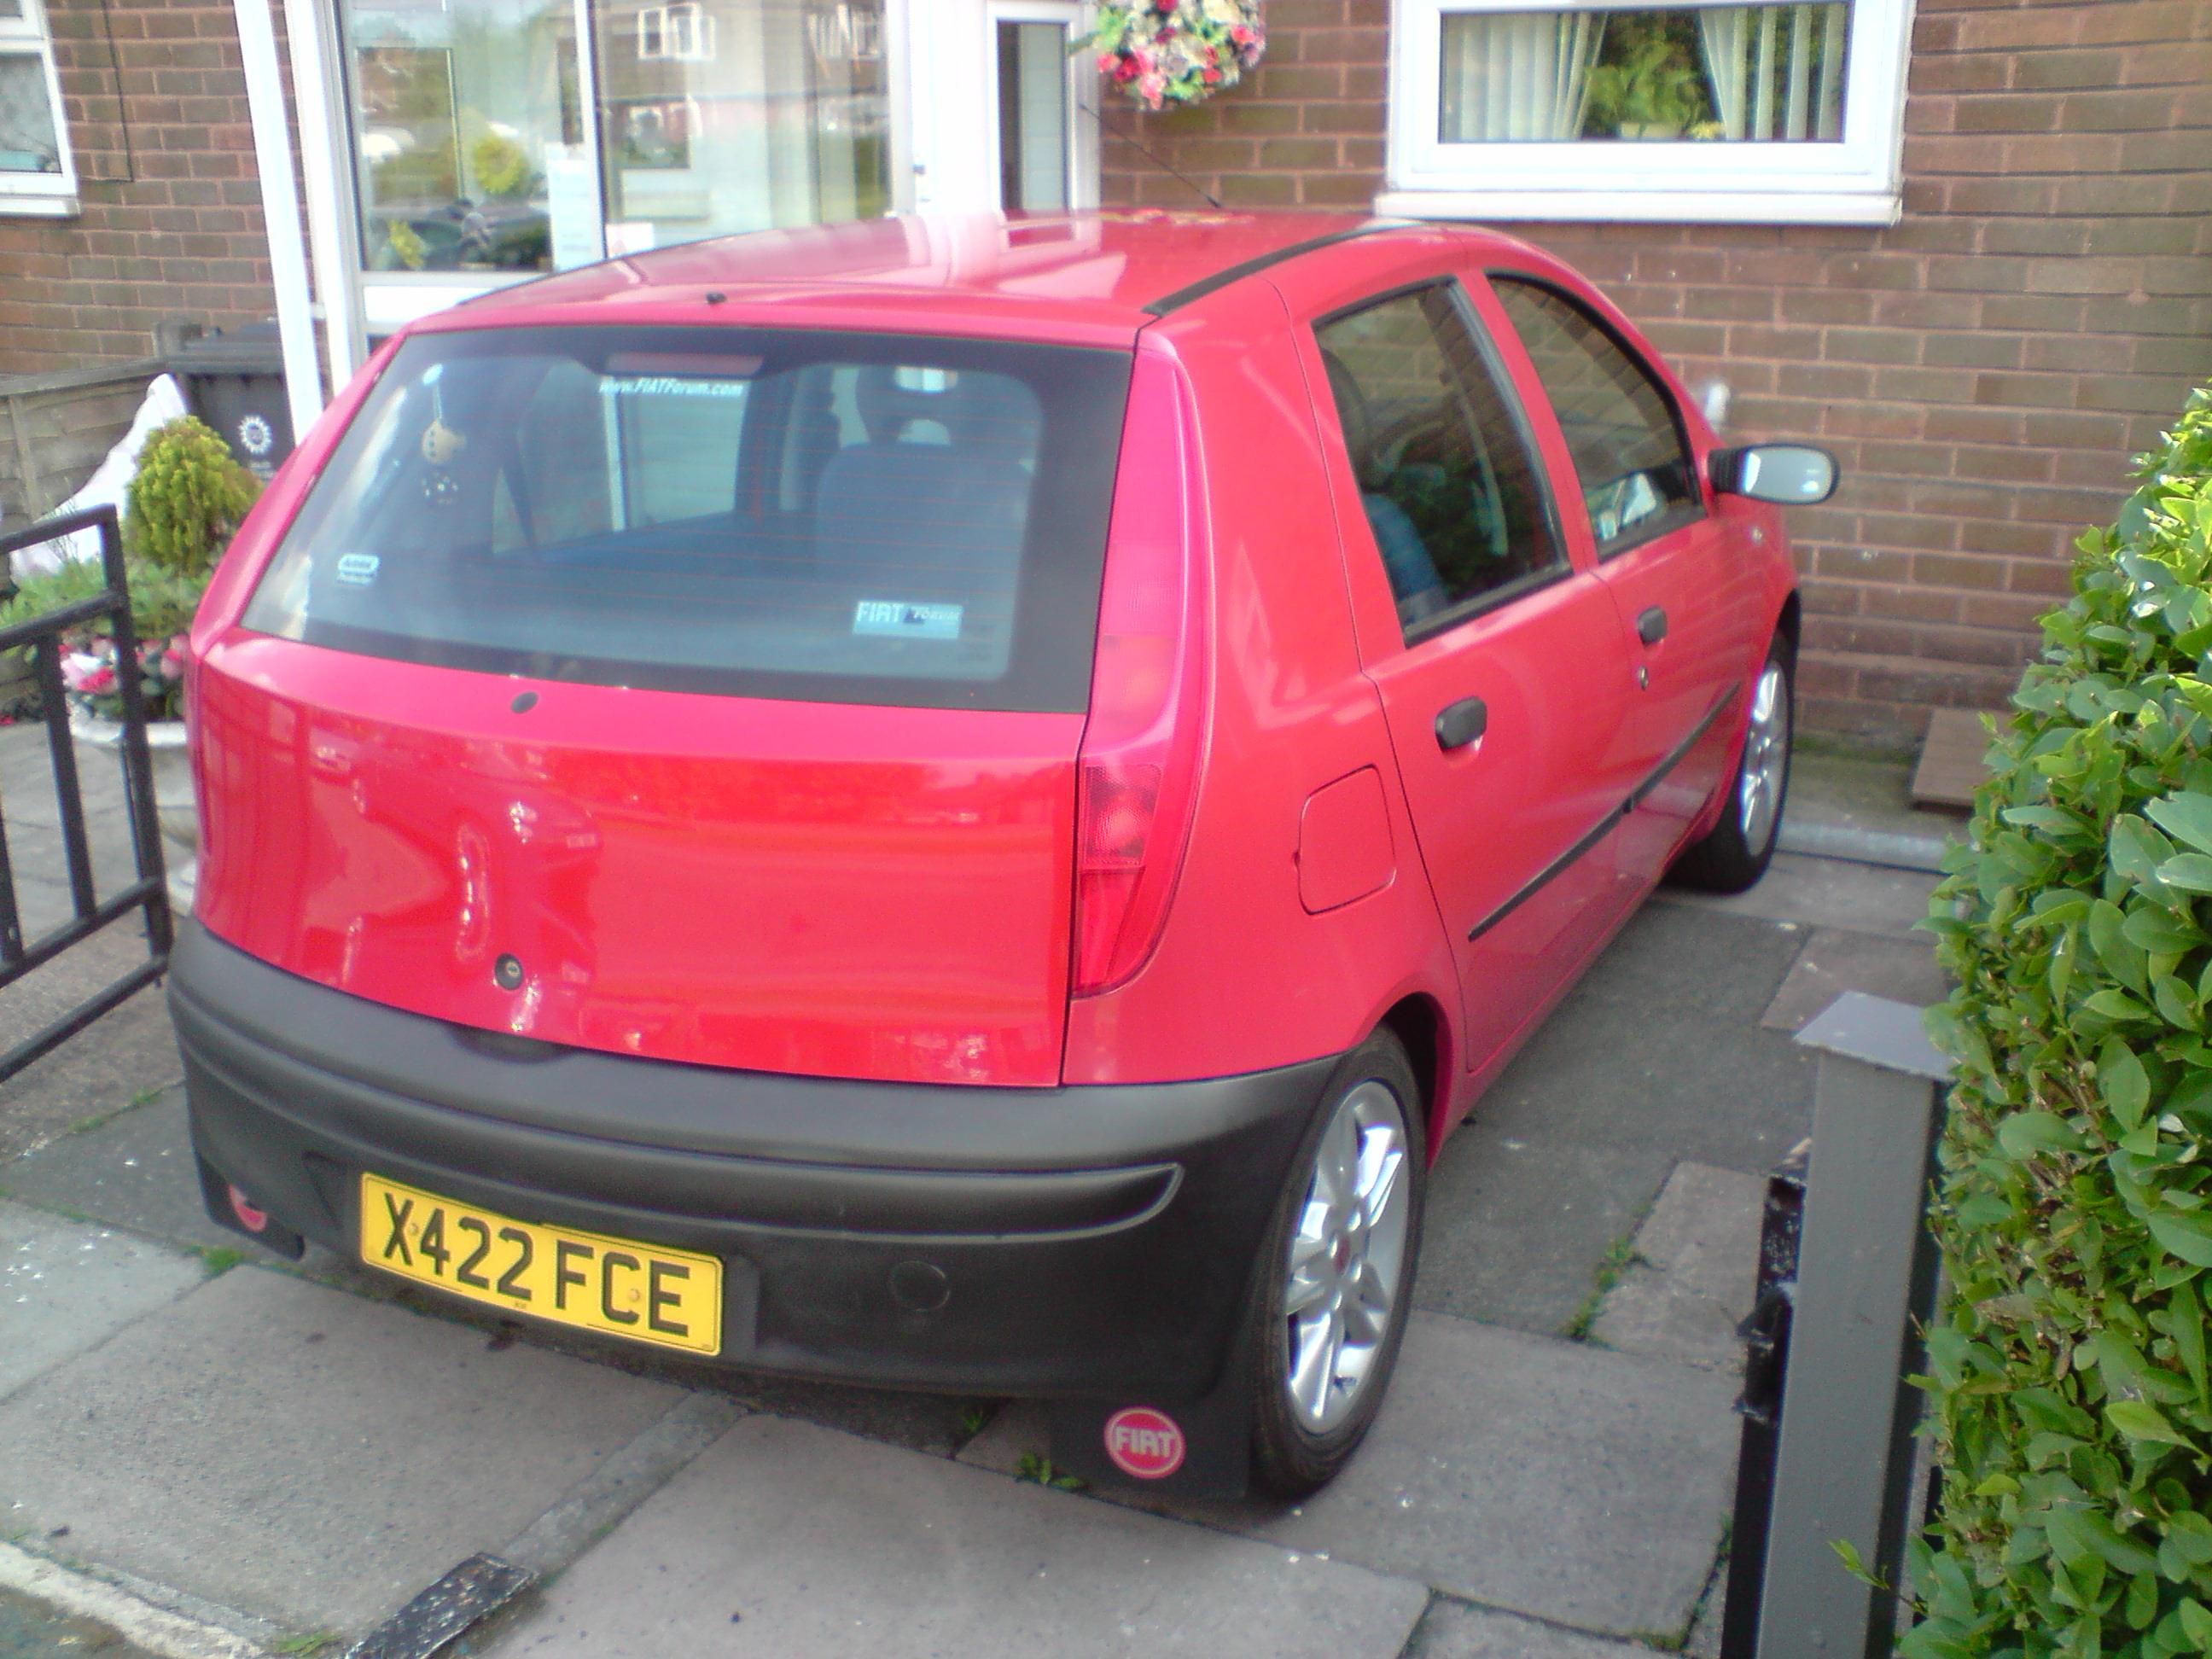 Punto  Mk2  2b   My Red 1 2 8v  Subtle Changes   Pic Heavy